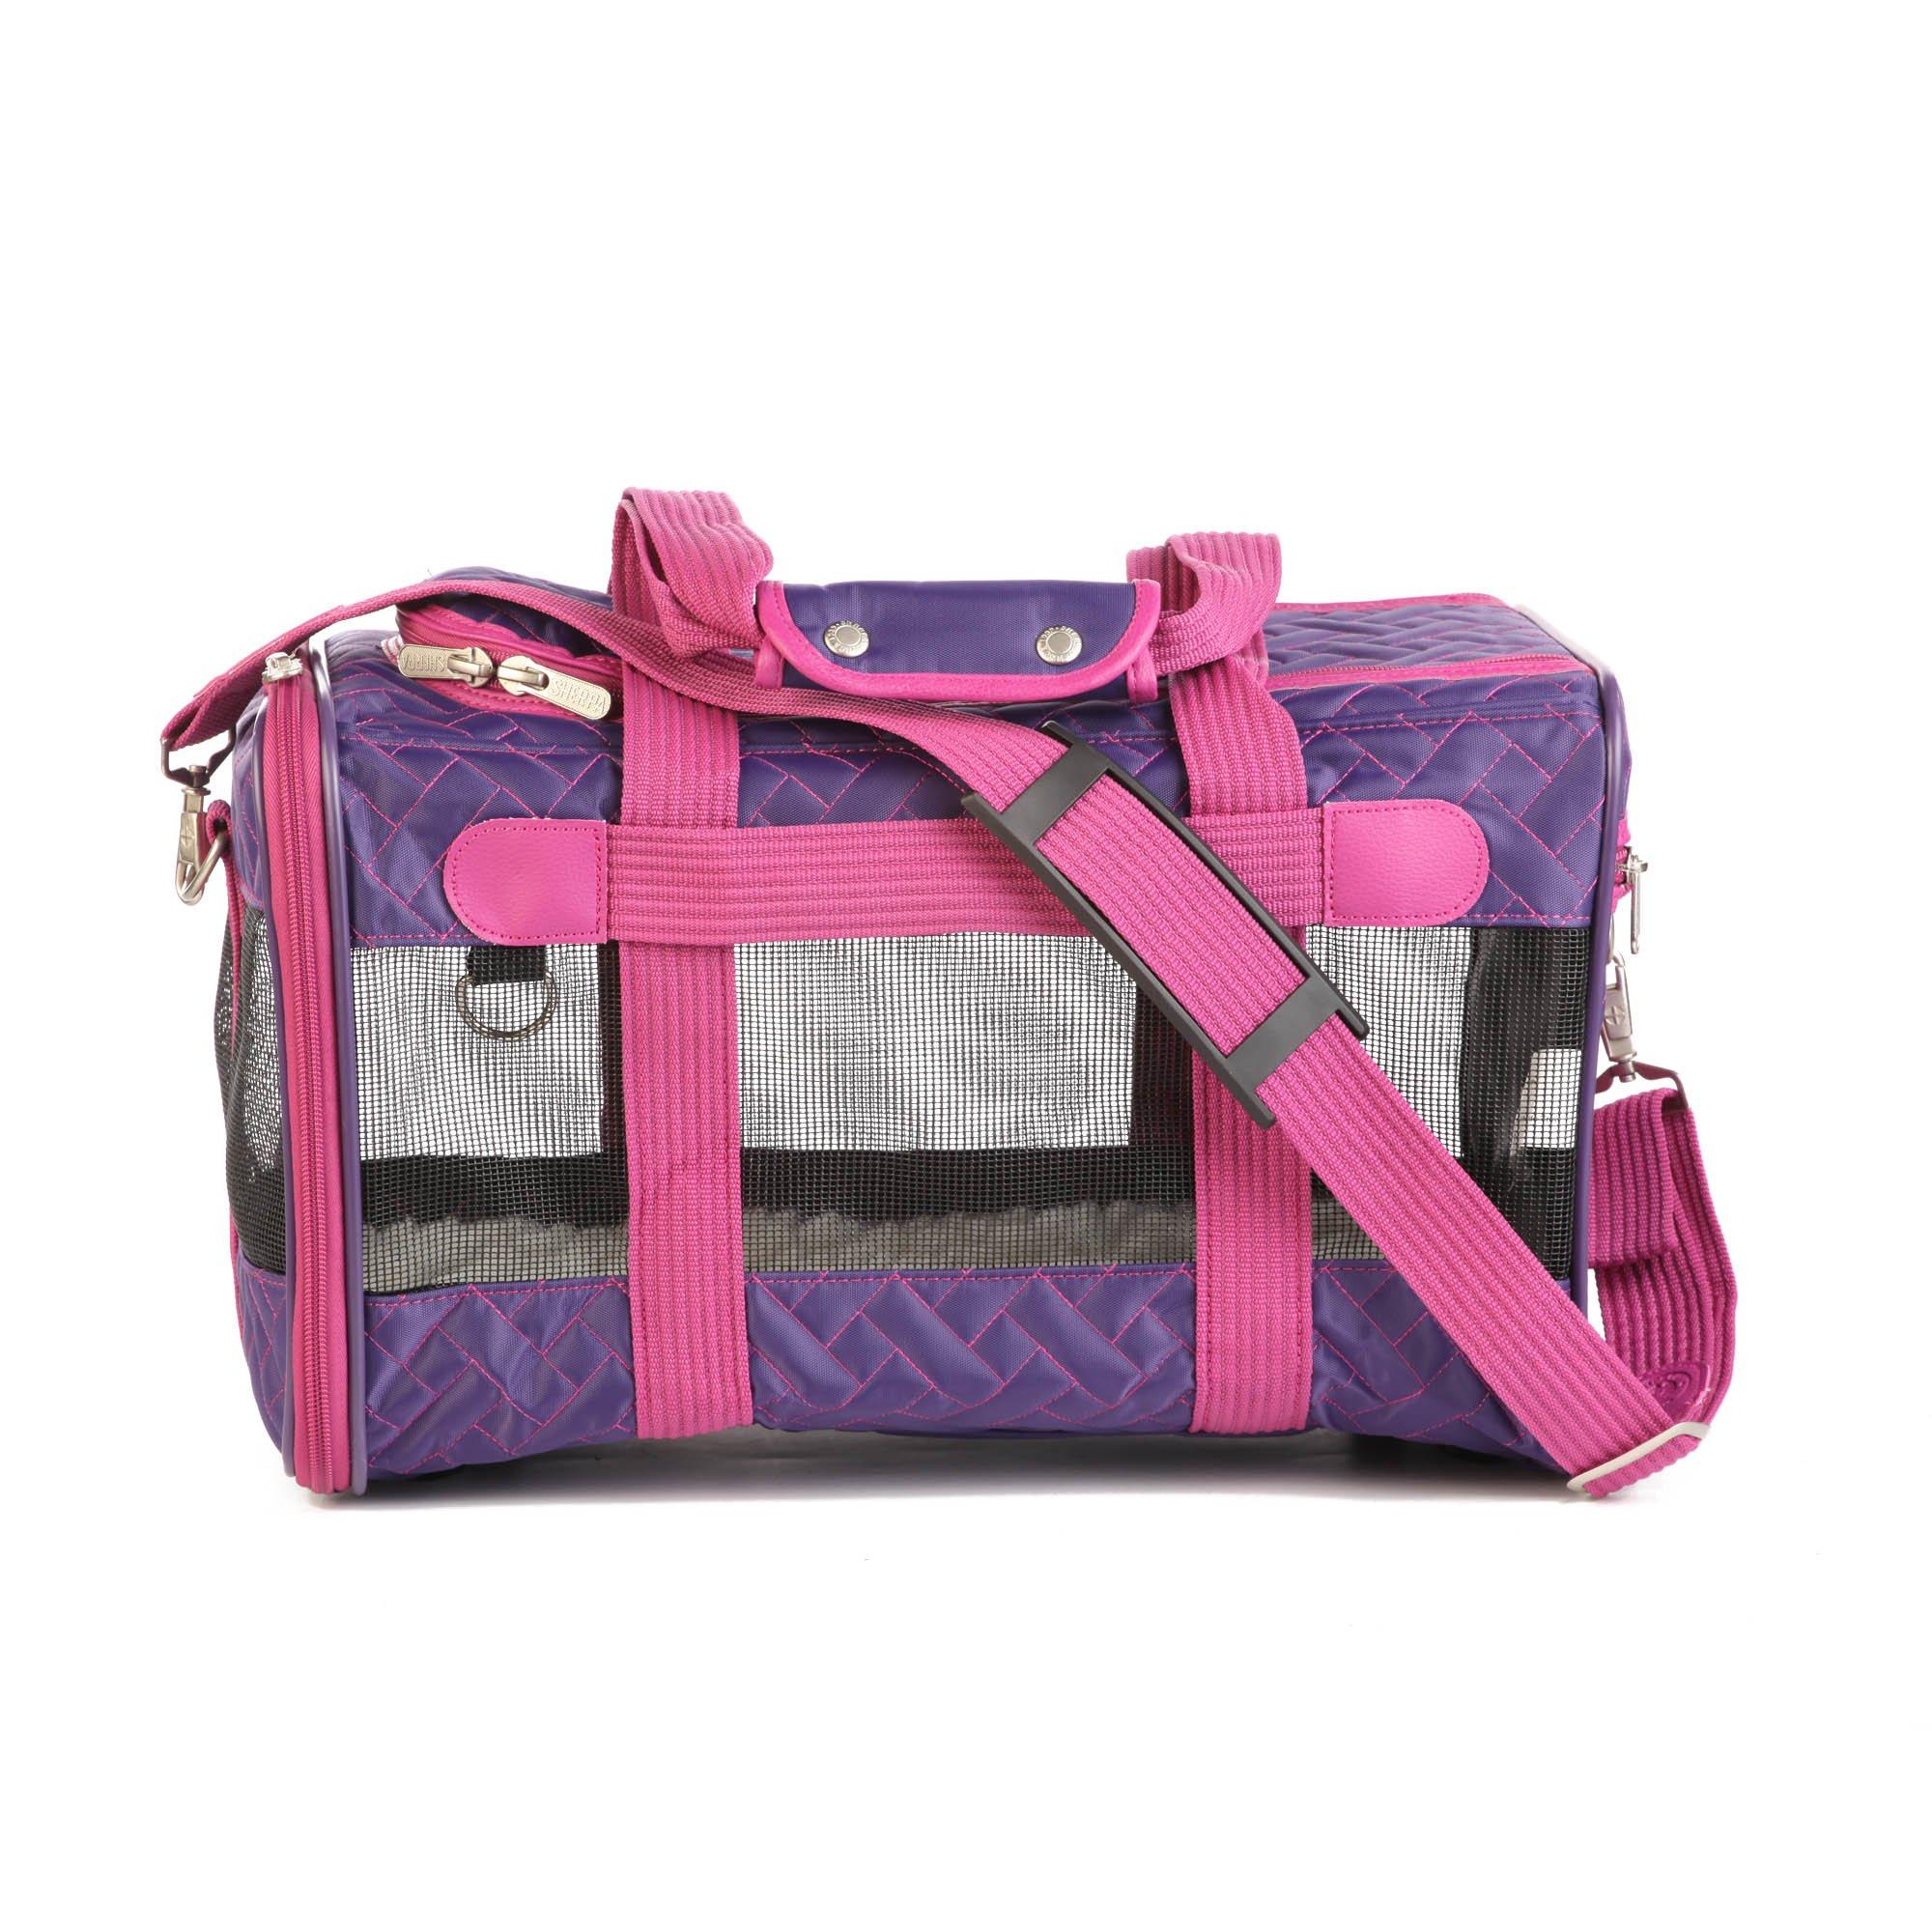 Sherpa Original Purple & Pink Dog Carrier